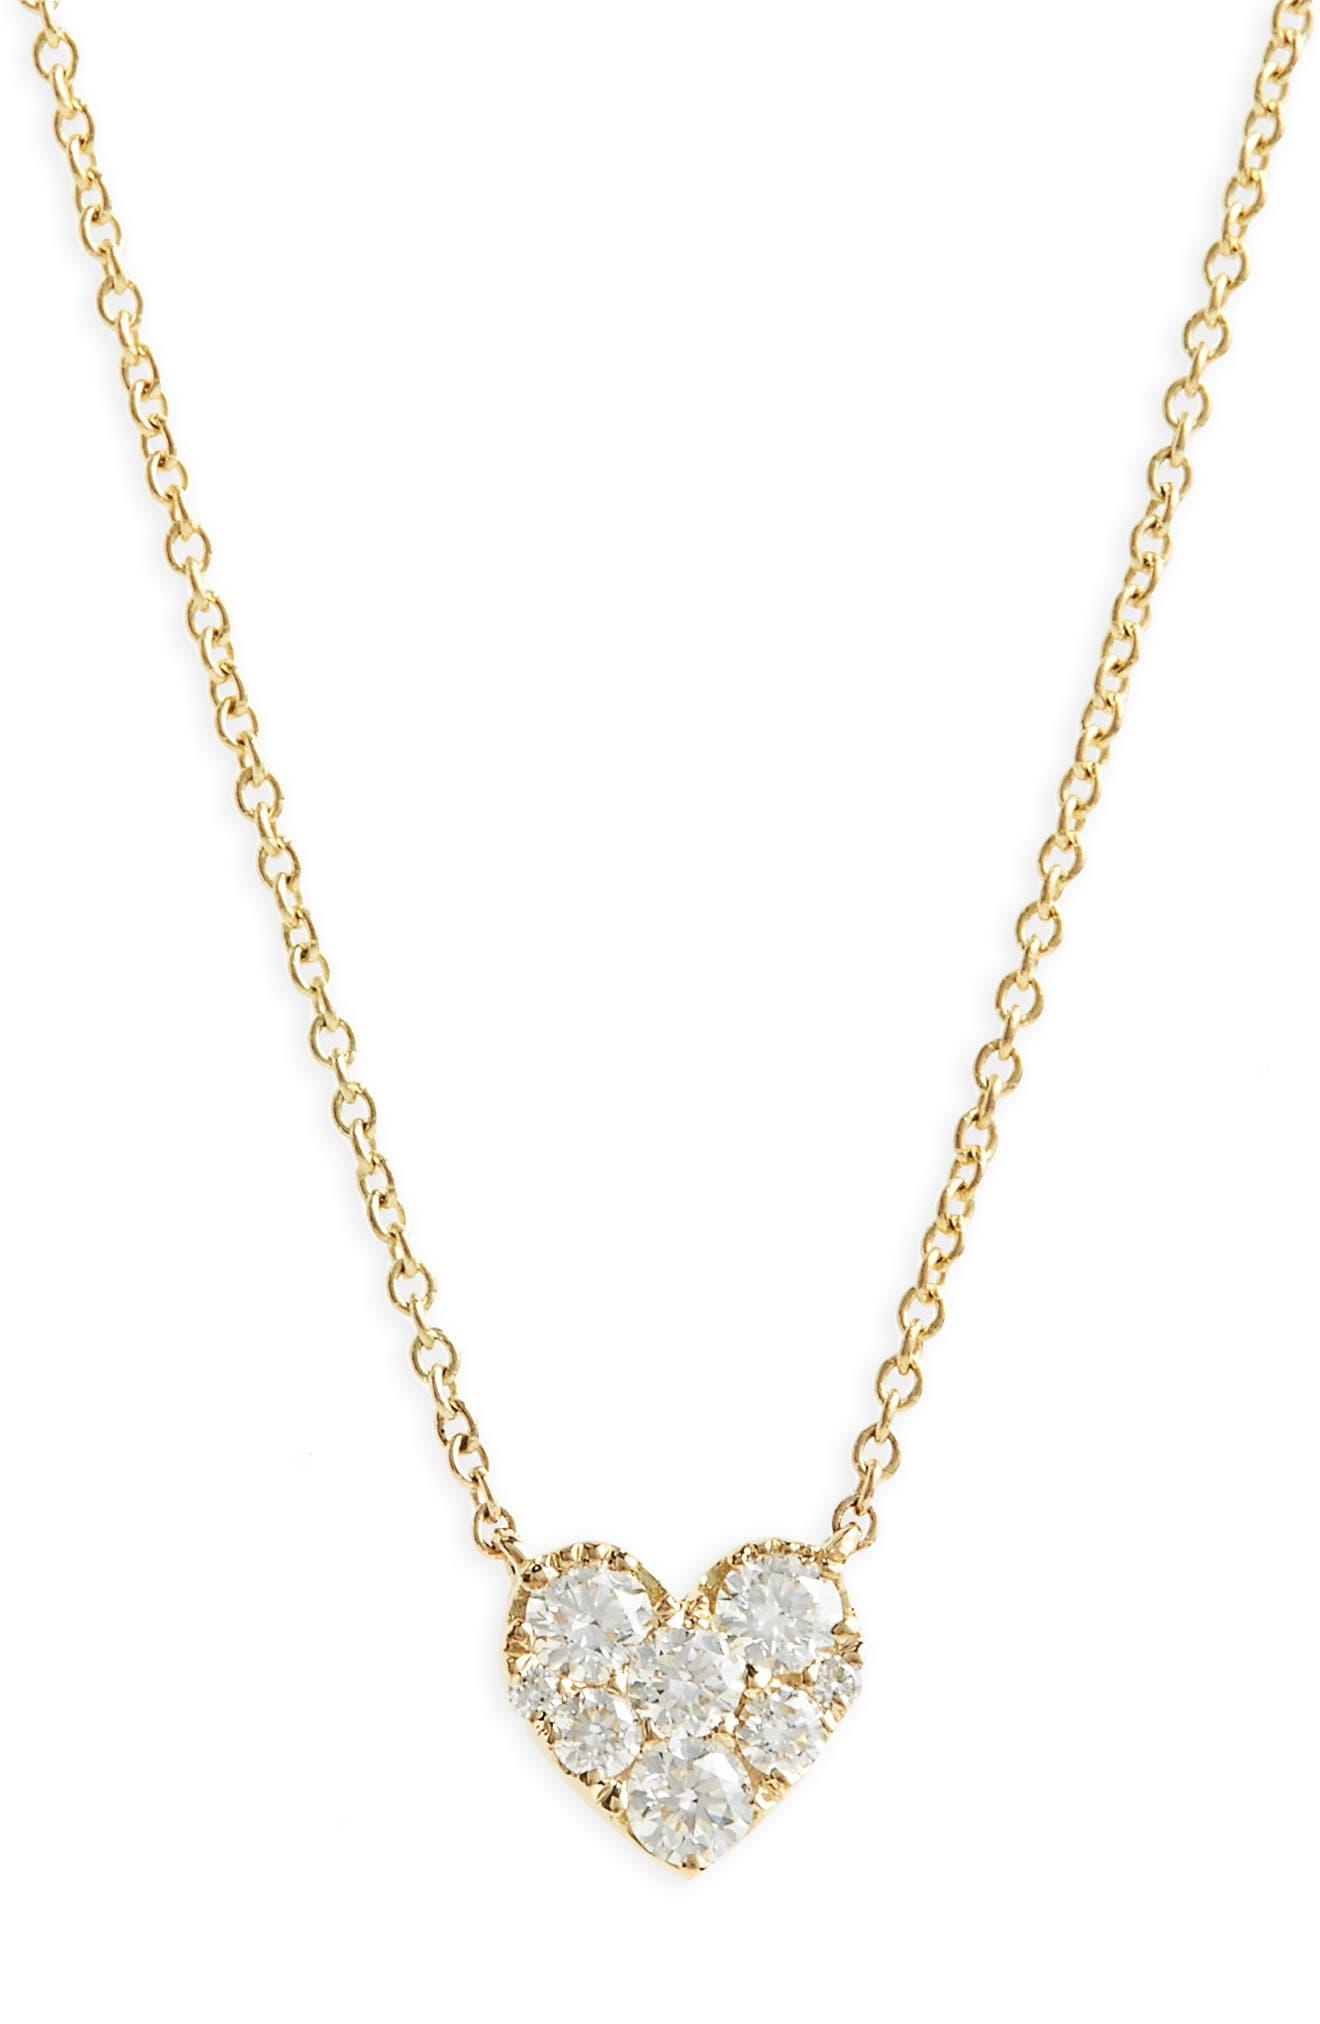 Heart Diamond Pendant Necklace,                         Main,                         color, YELLOW GOLD